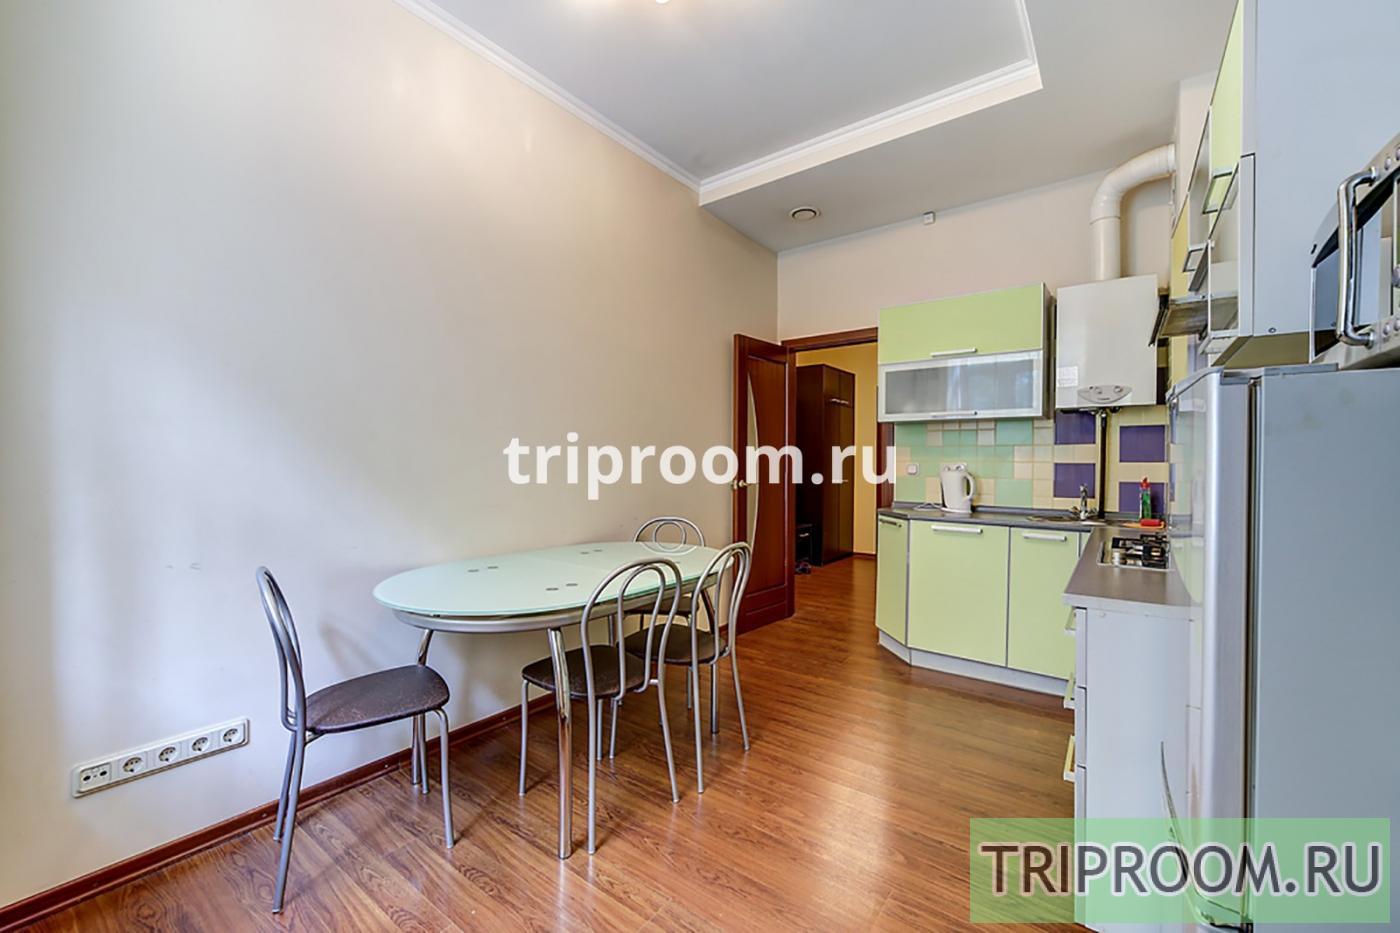 1-комнатная квартира посуточно (вариант № 15527), ул. Канала Грибоедова набережная, фото № 6